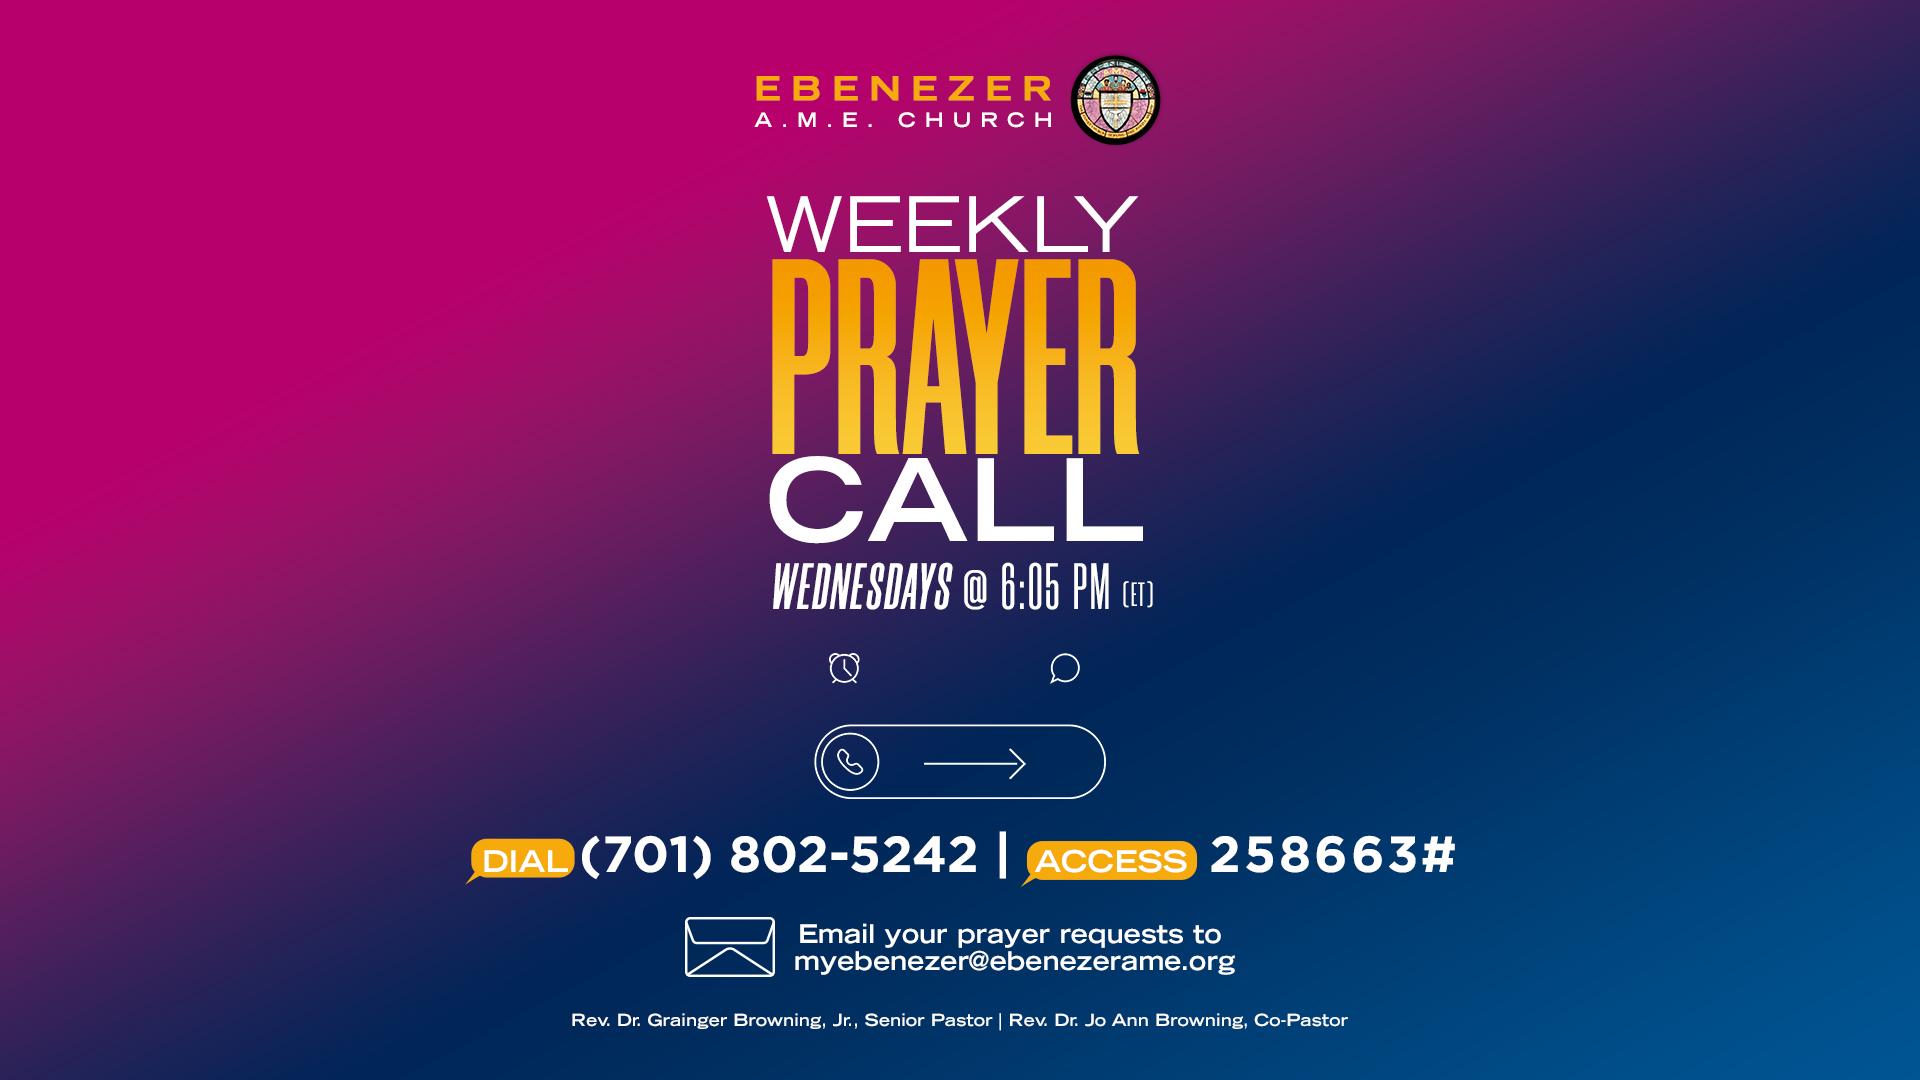 Churchwide prayer call